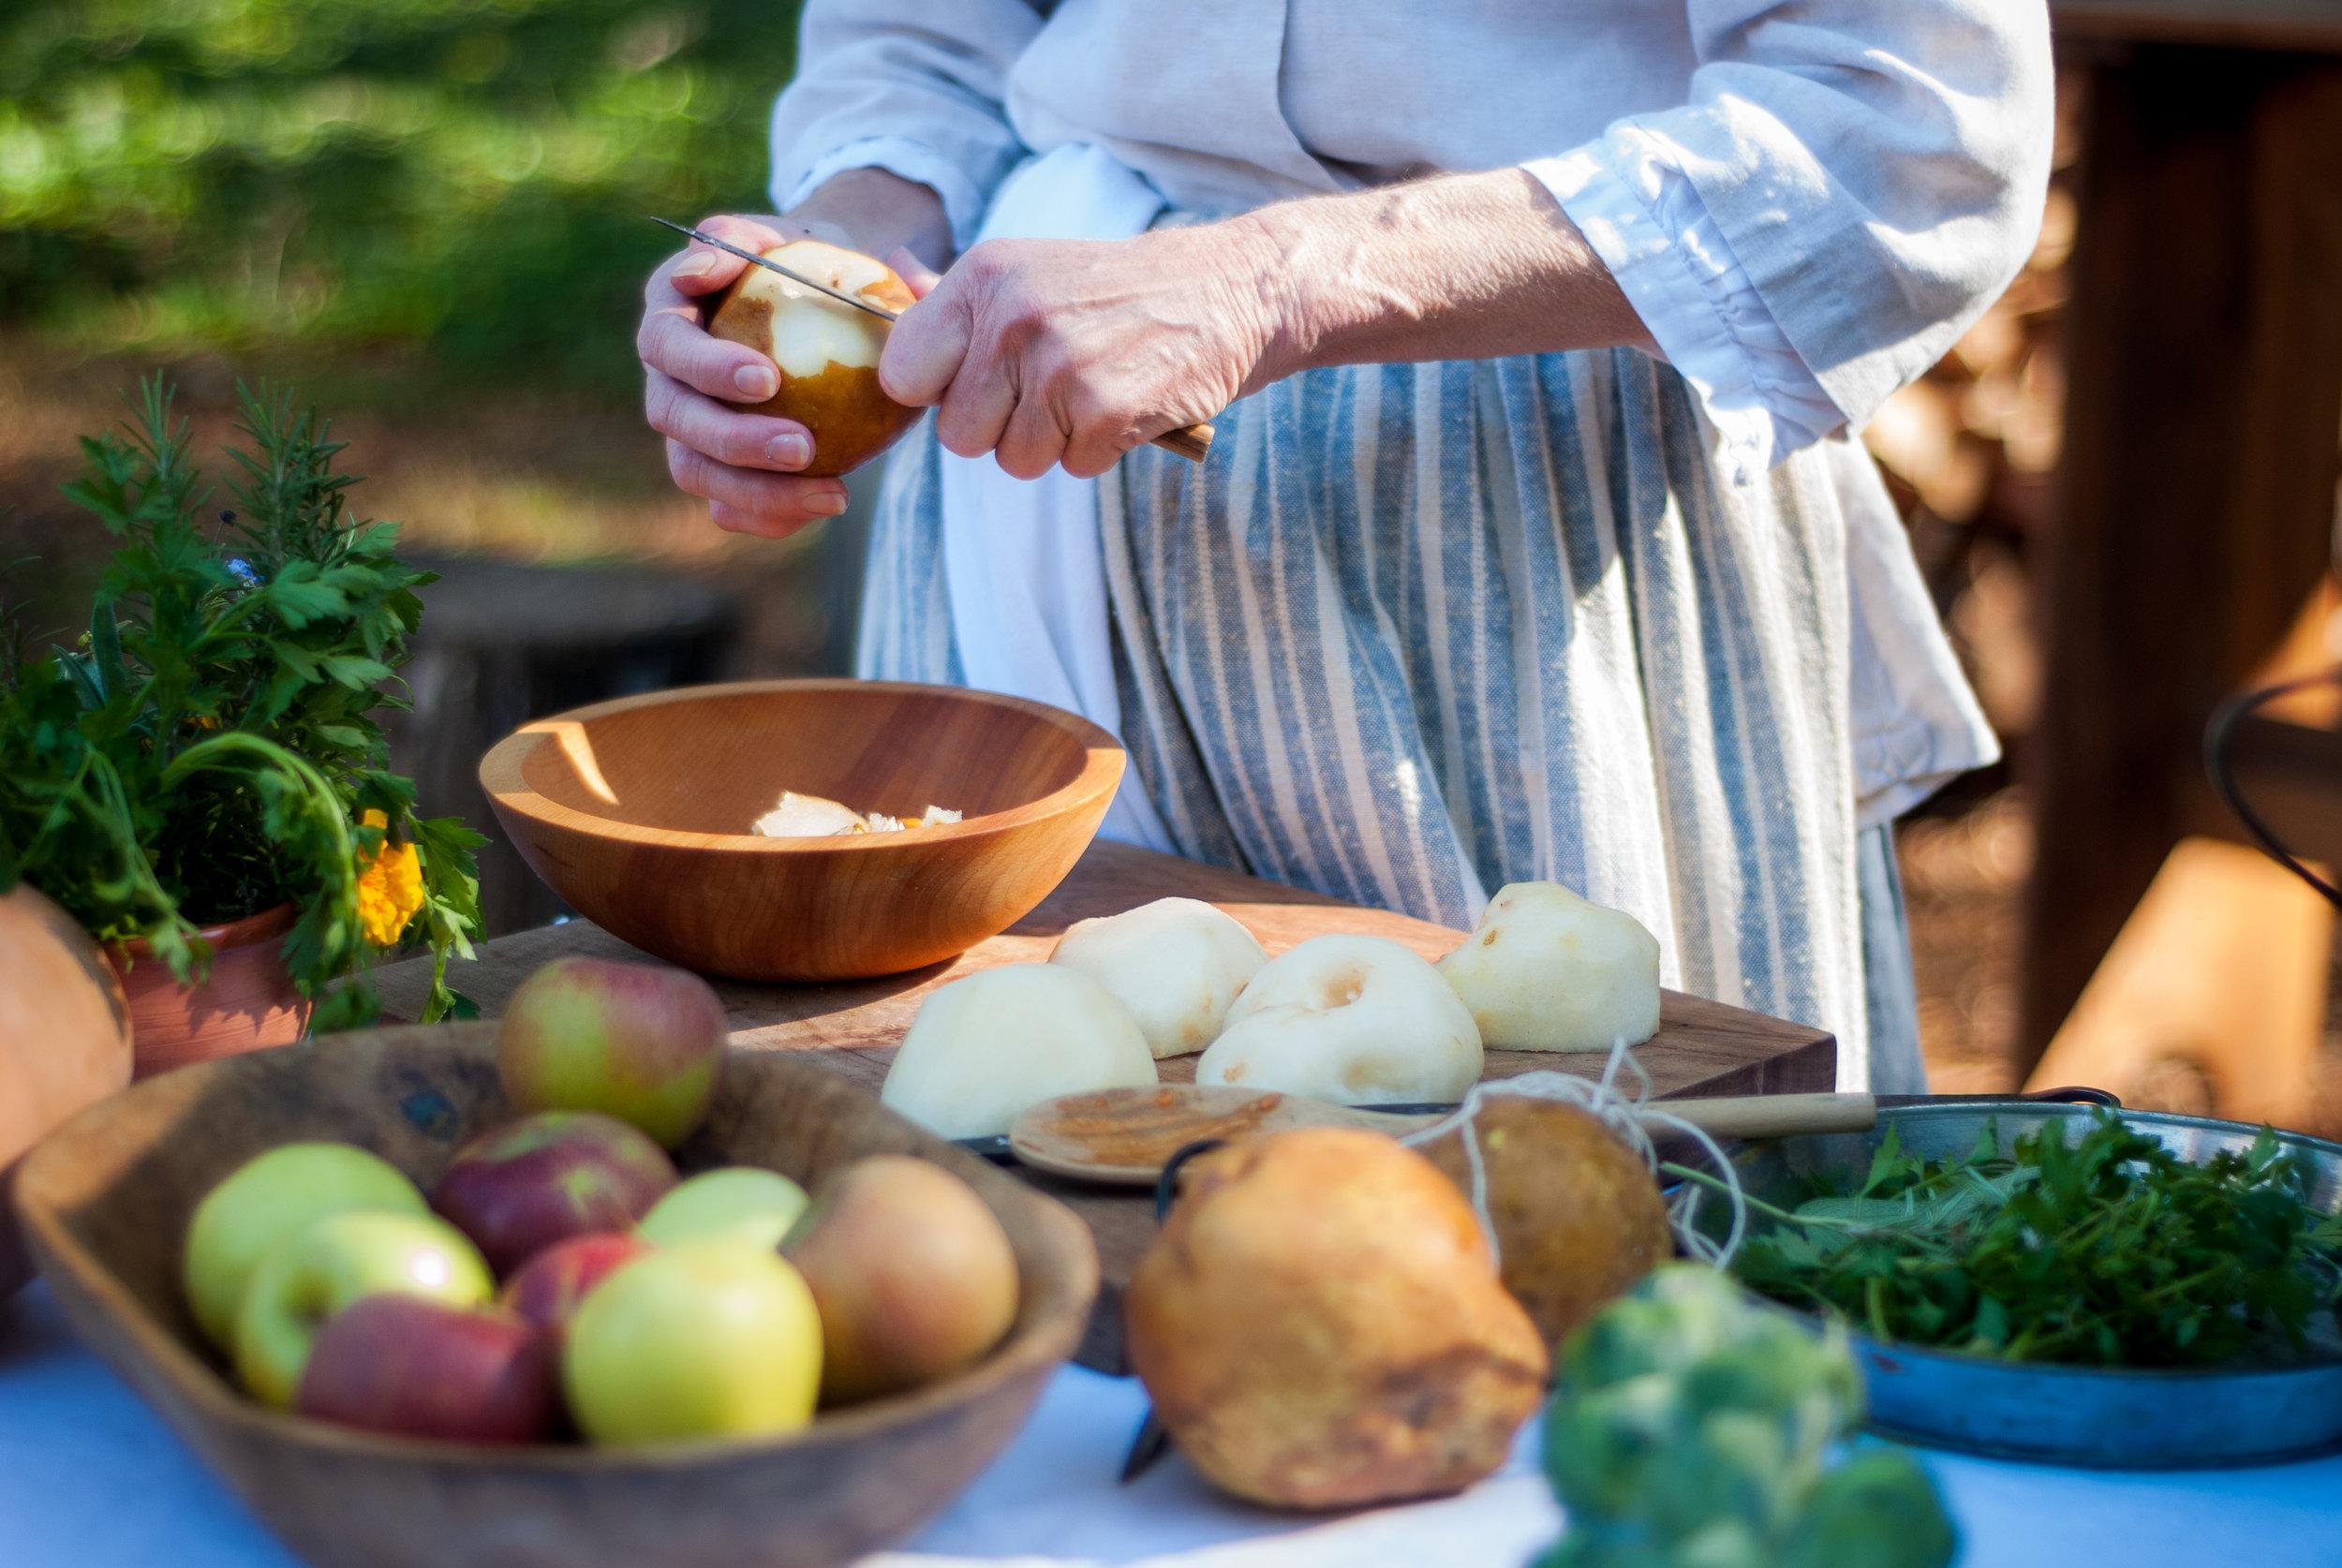 Recipe Card - — 4 Pears— 9 Apples— 2 Bunches Parsley— 1 Handful Arugula— 2 Broccoli Florets